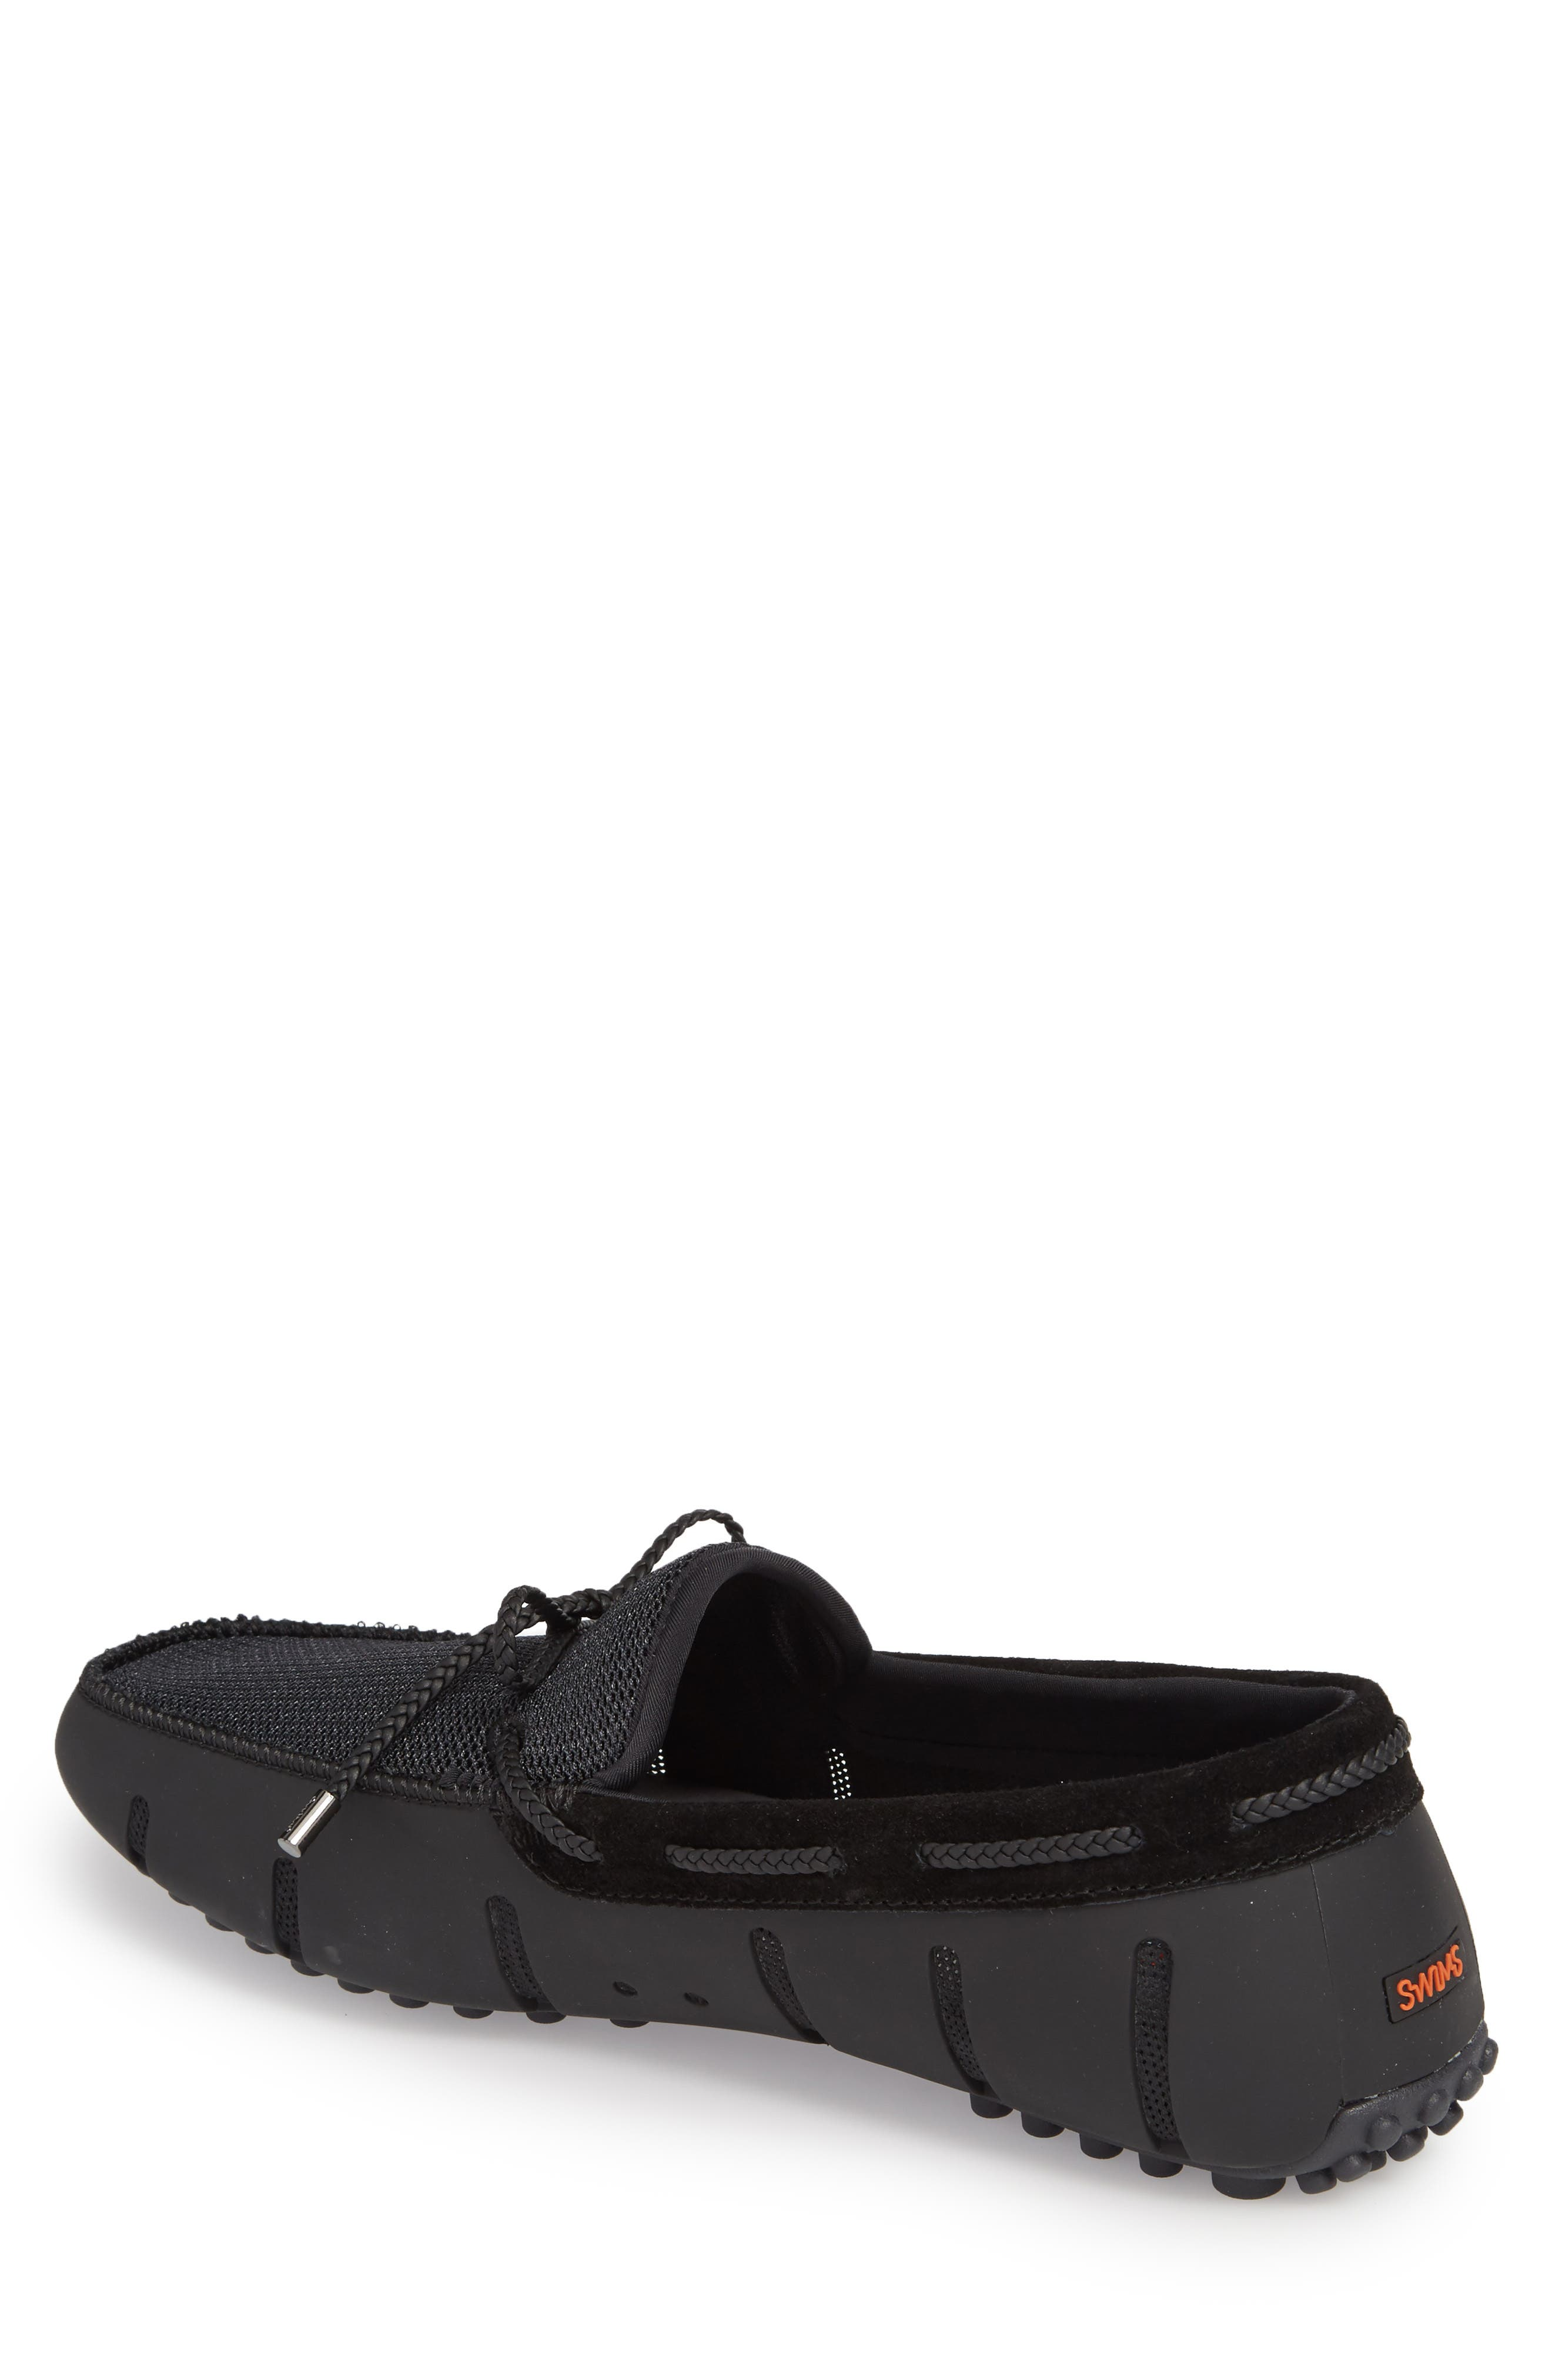 Driving Shoe,                             Alternate thumbnail 2, color,                             Black/ Graphite